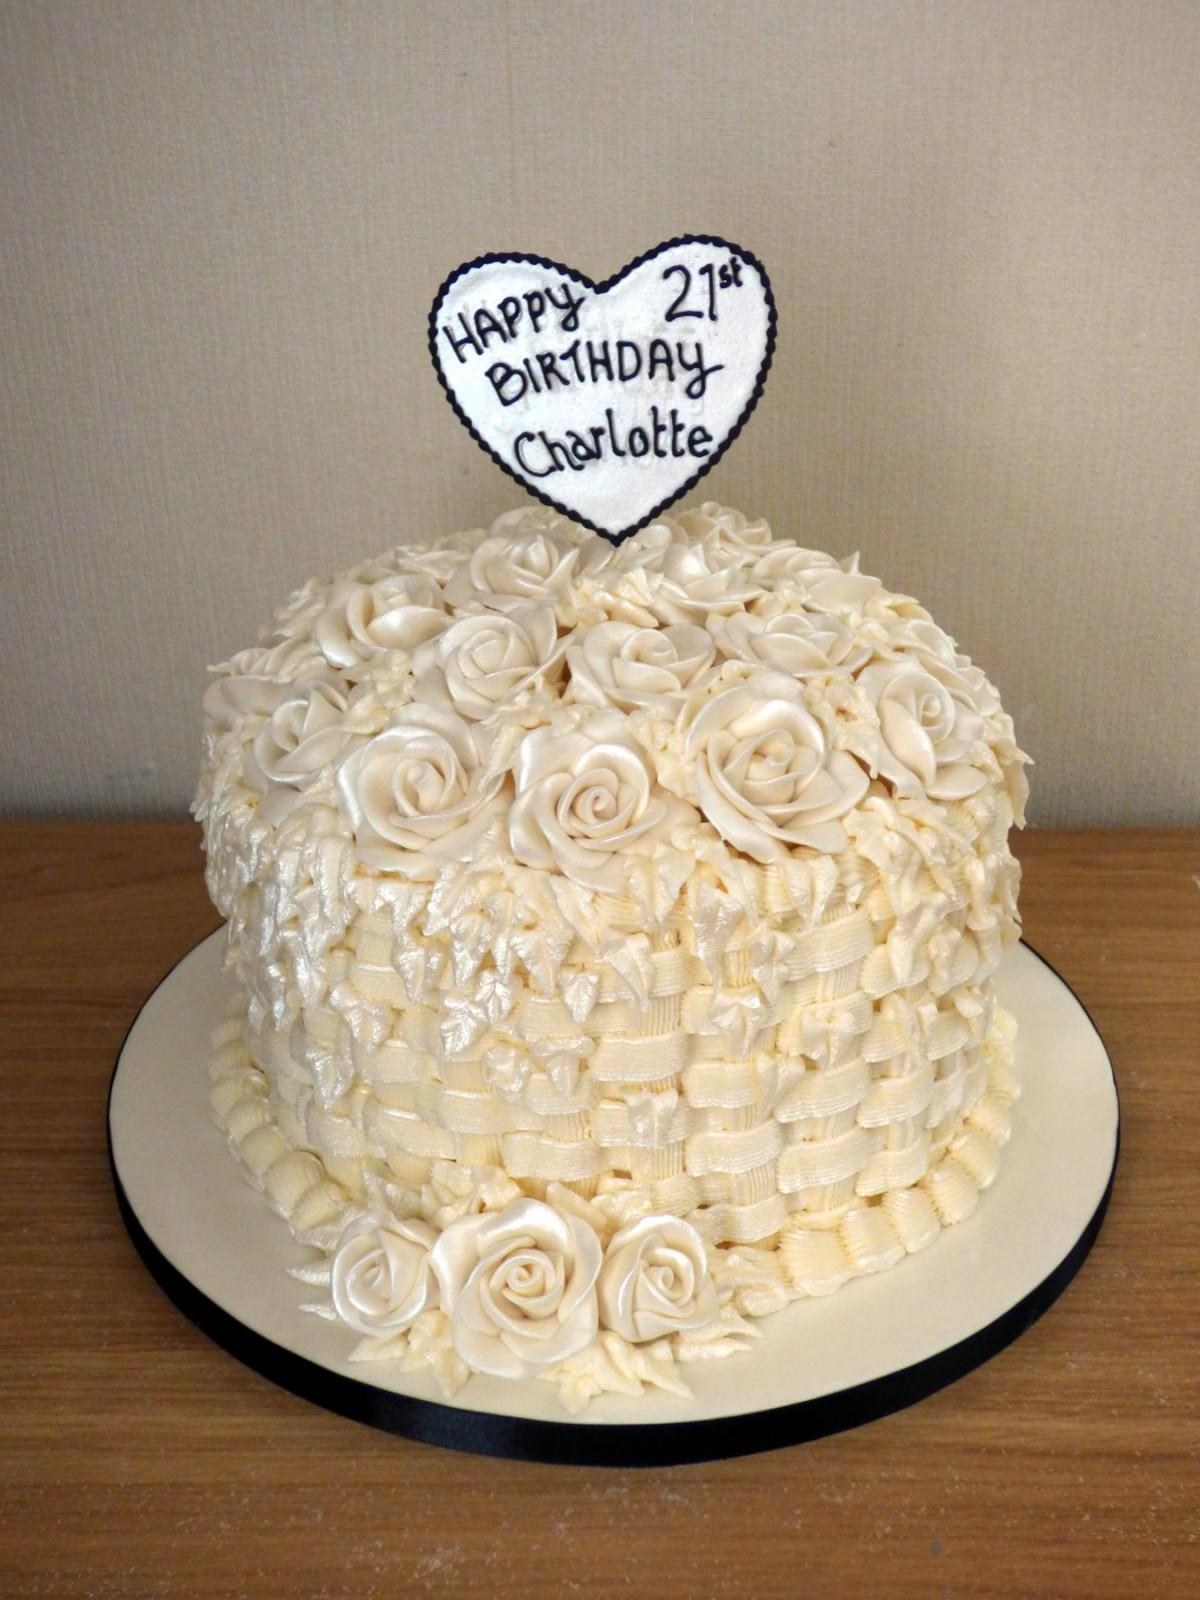 Best ideas about Birthday Cake Photo . Save or Pin Kylie Kardashian Inspired Birthday Cake Susie s Cakes Now.